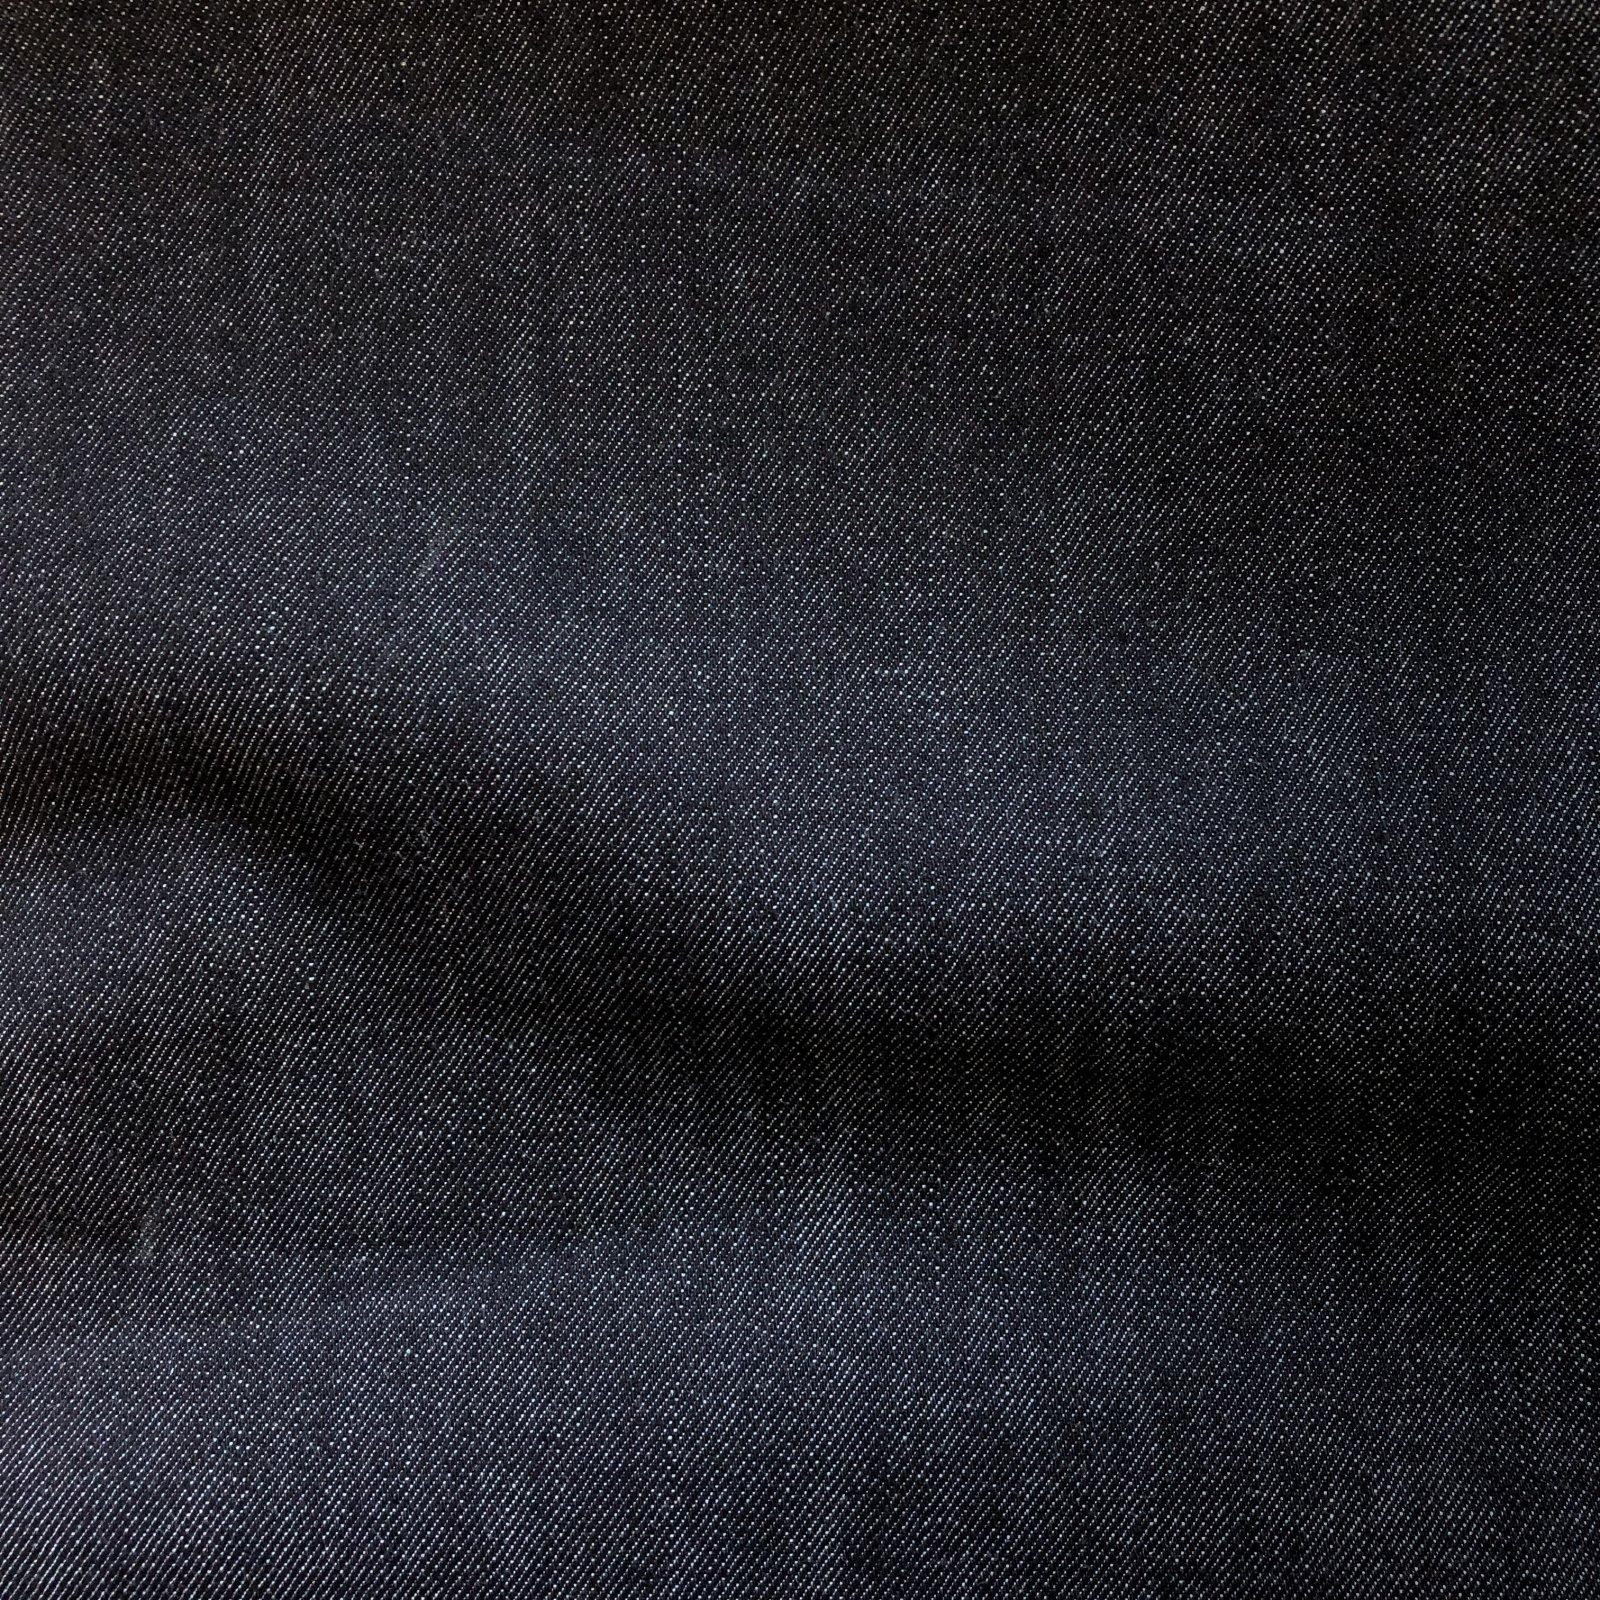 Cone Mills - 11oz Stretch Denim - Eclipse